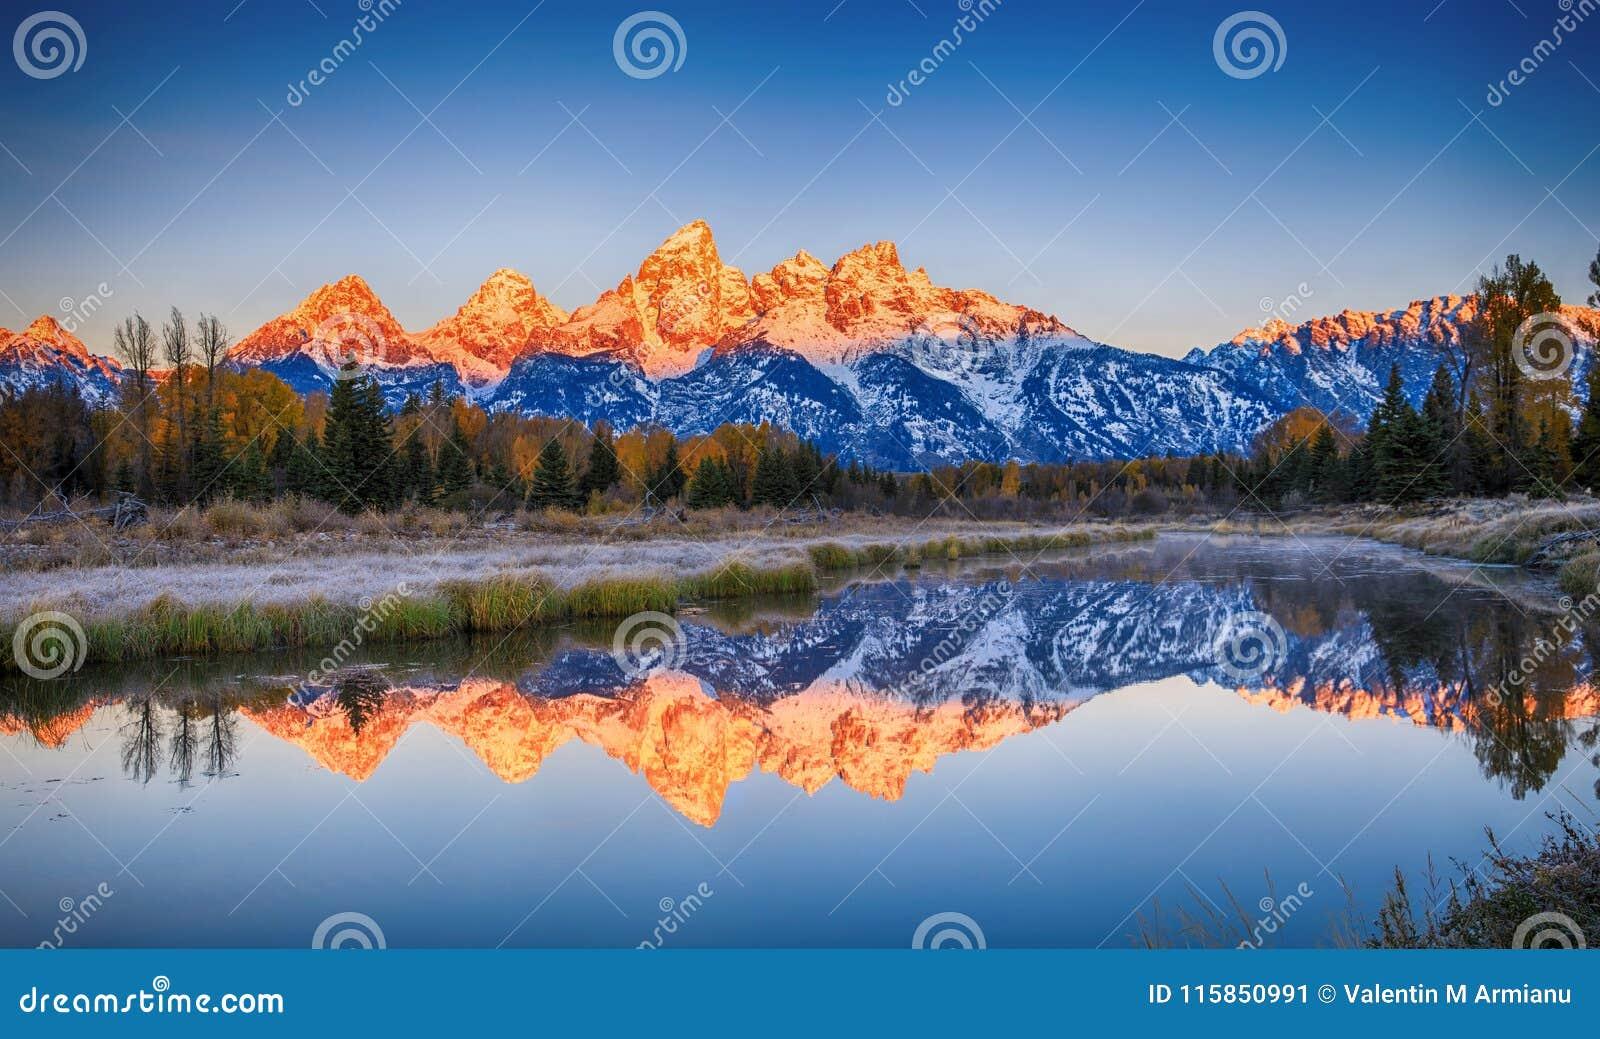 Schwabacher`s Landing, Grand Teton National Park